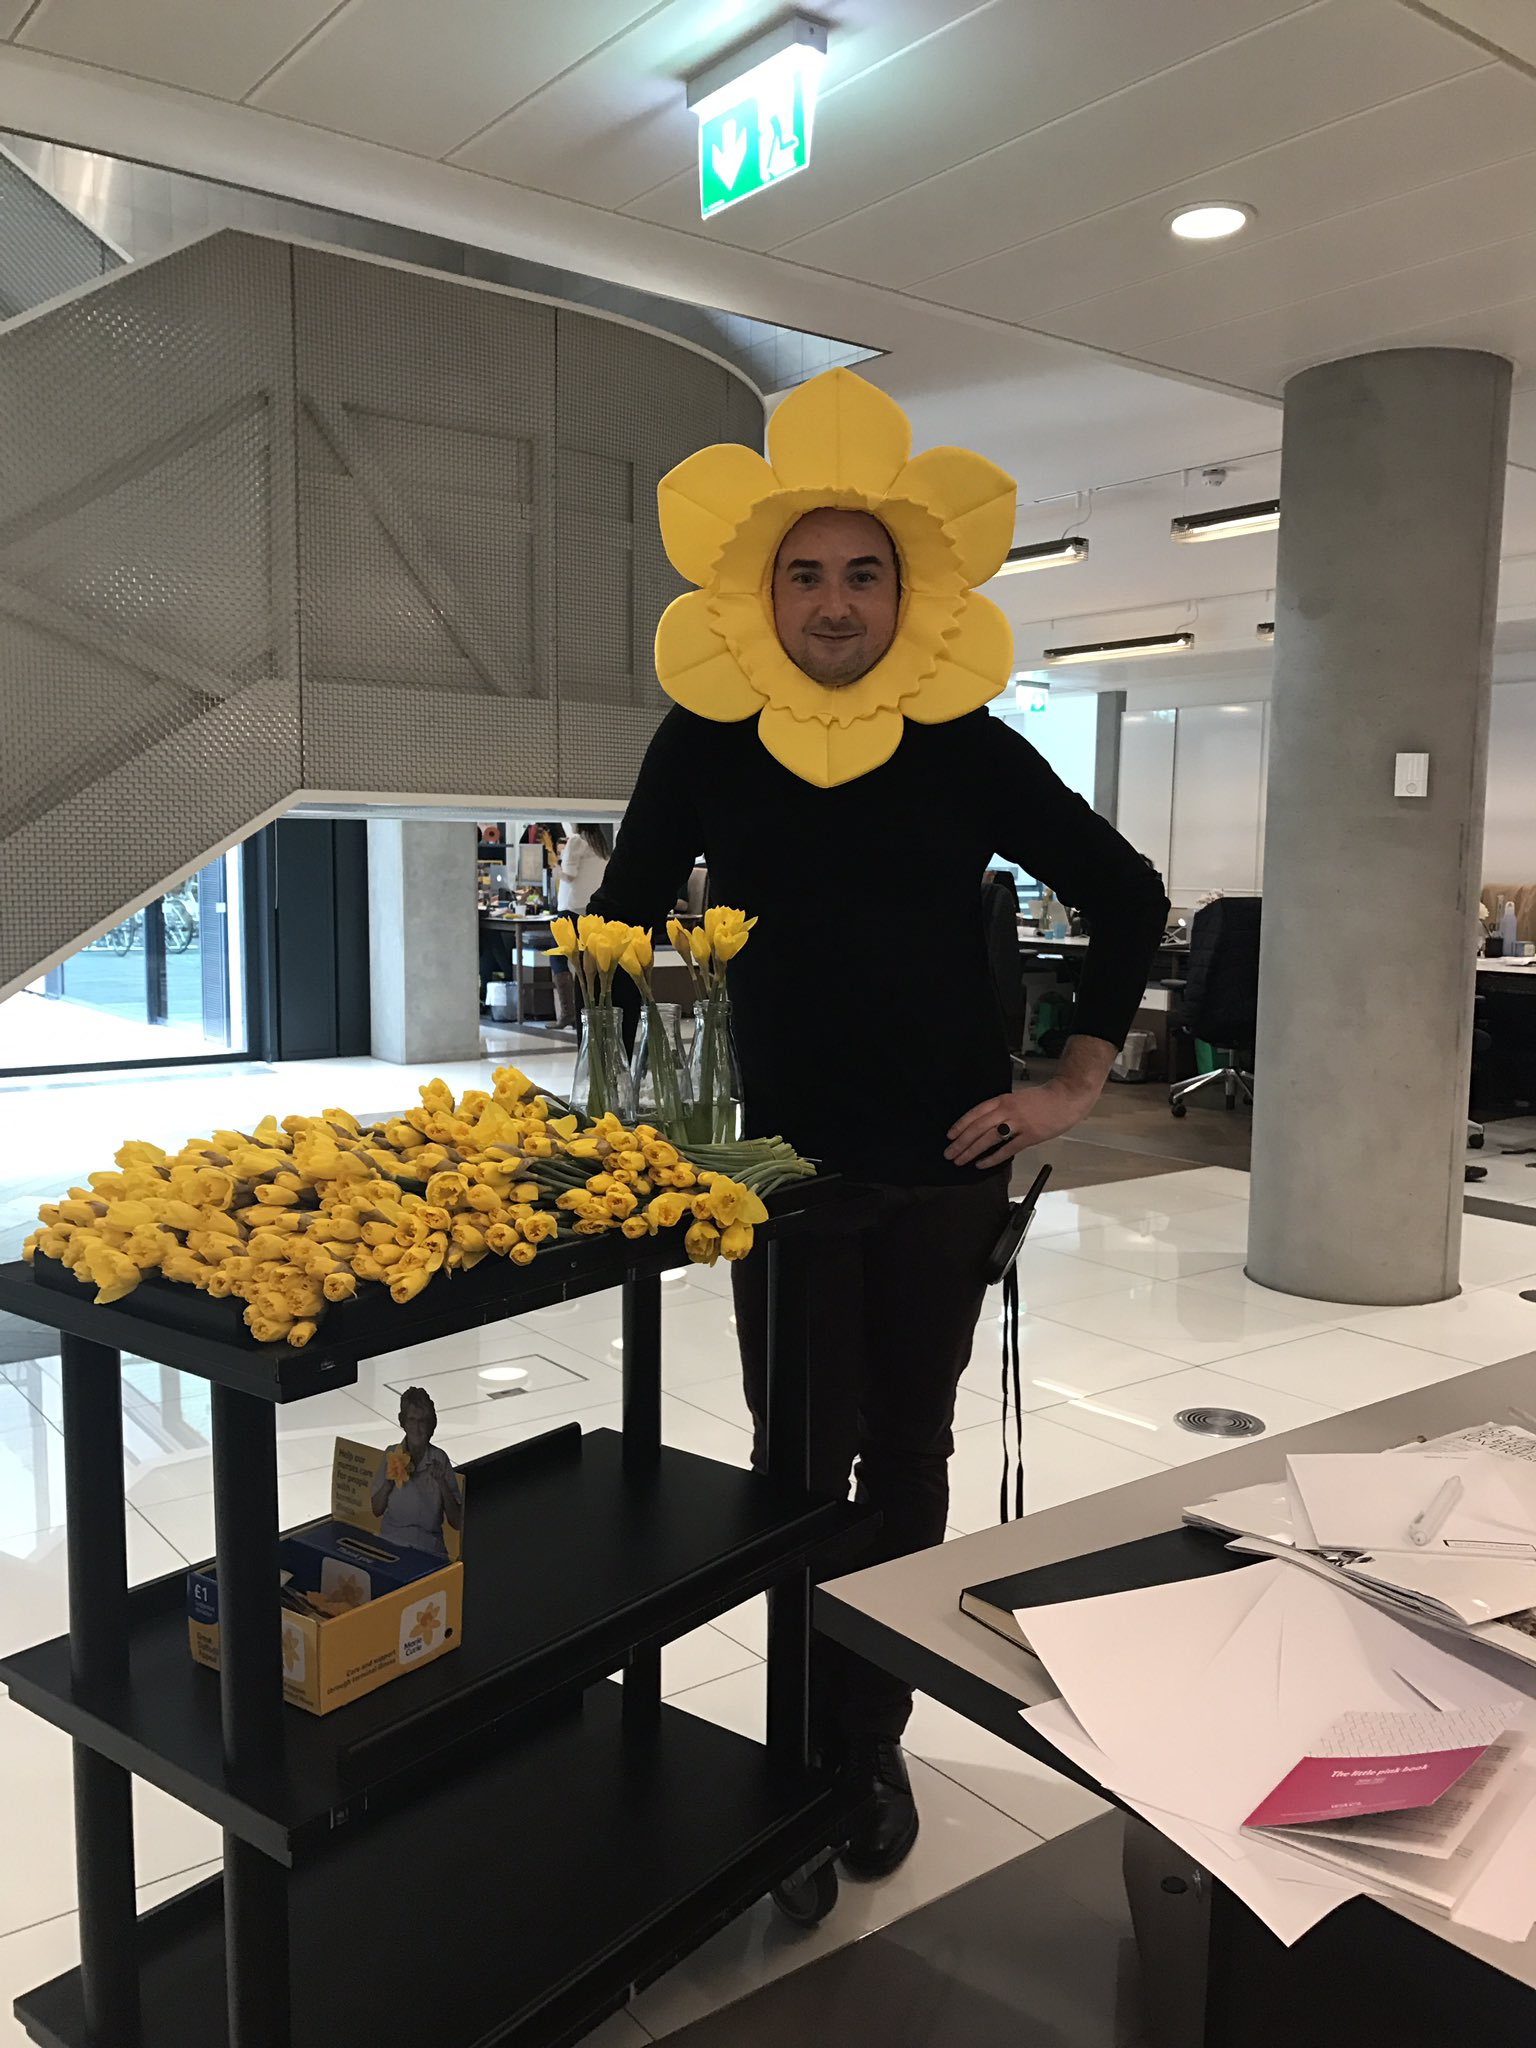 Hello flower @mariecurieuk @PierrePPaton https://t.co/rJLcNmE11F